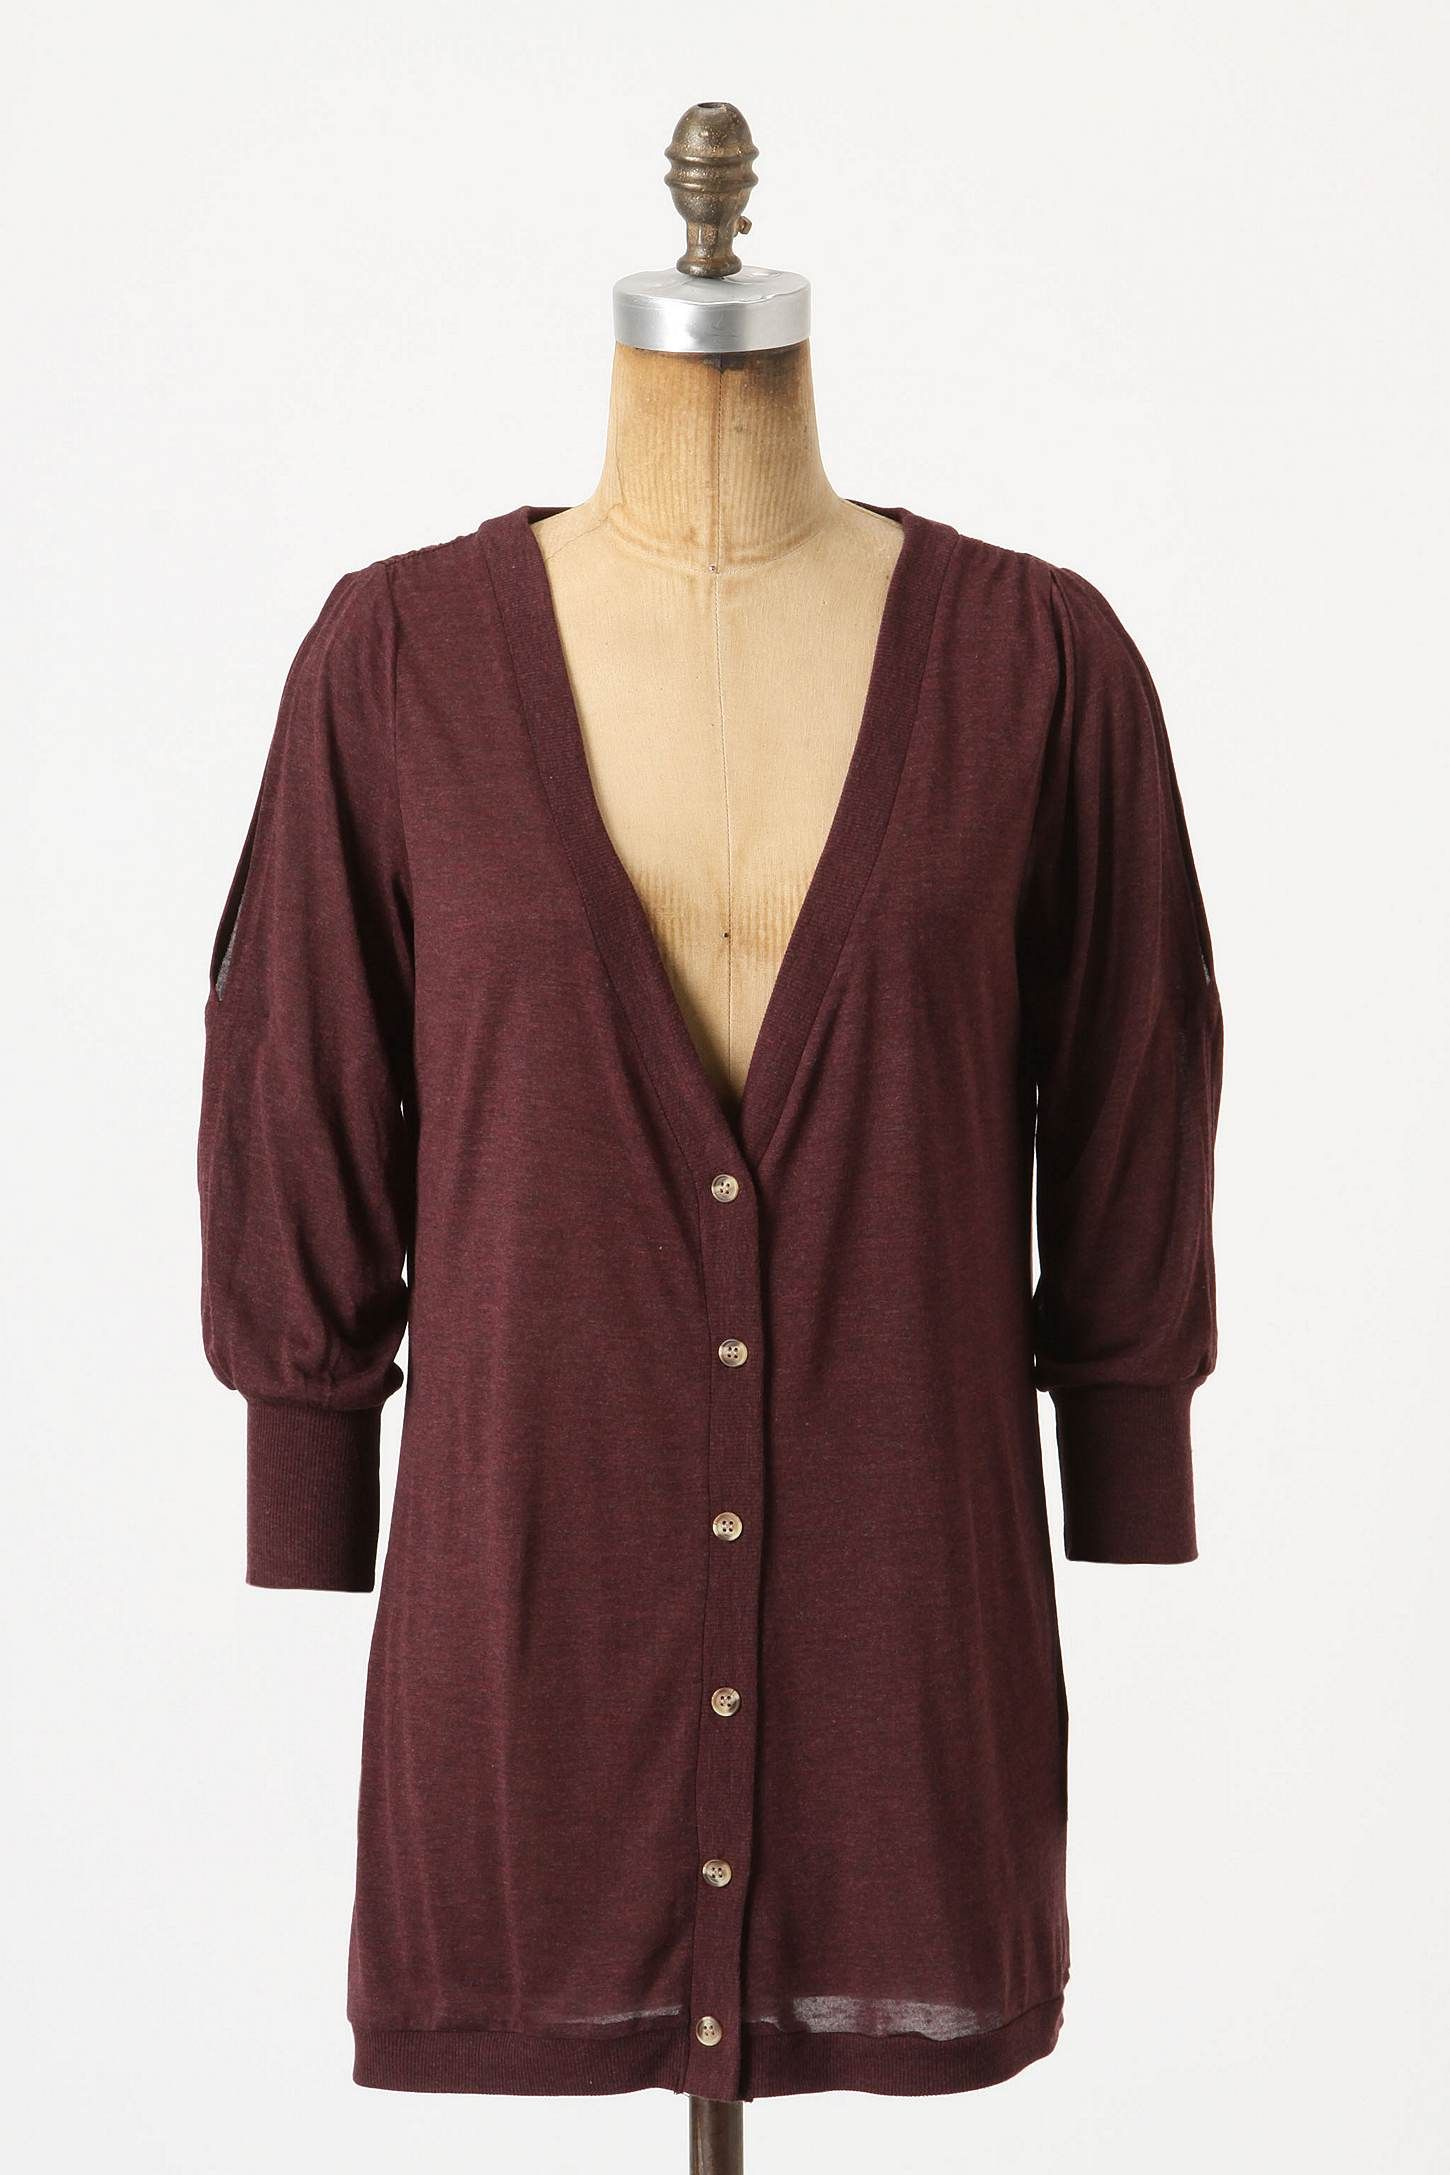 i love cardigans. | my niche | Pinterest | Wardrobes and Fashion